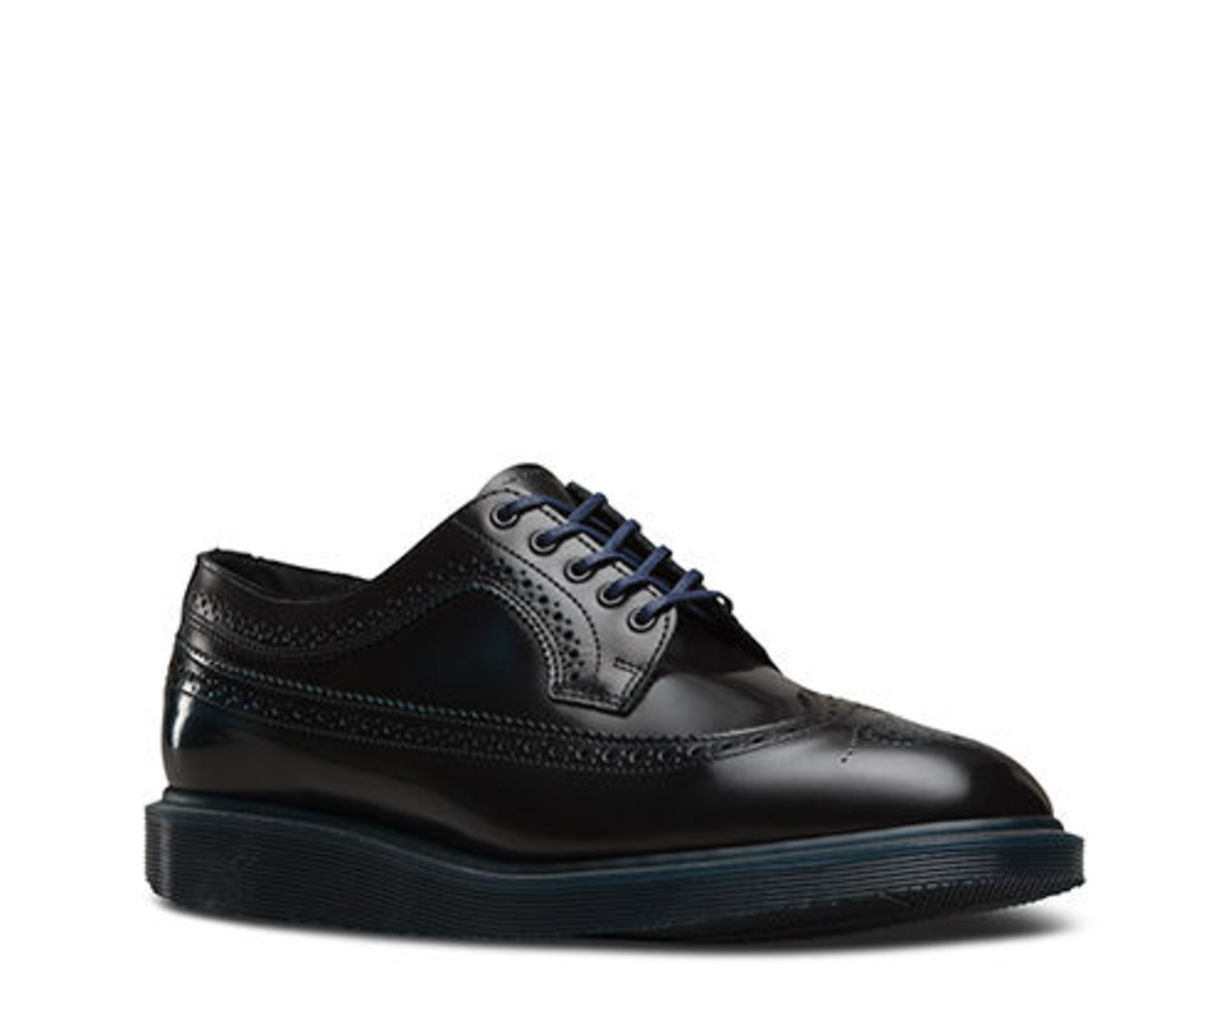 Kilsby Shoe